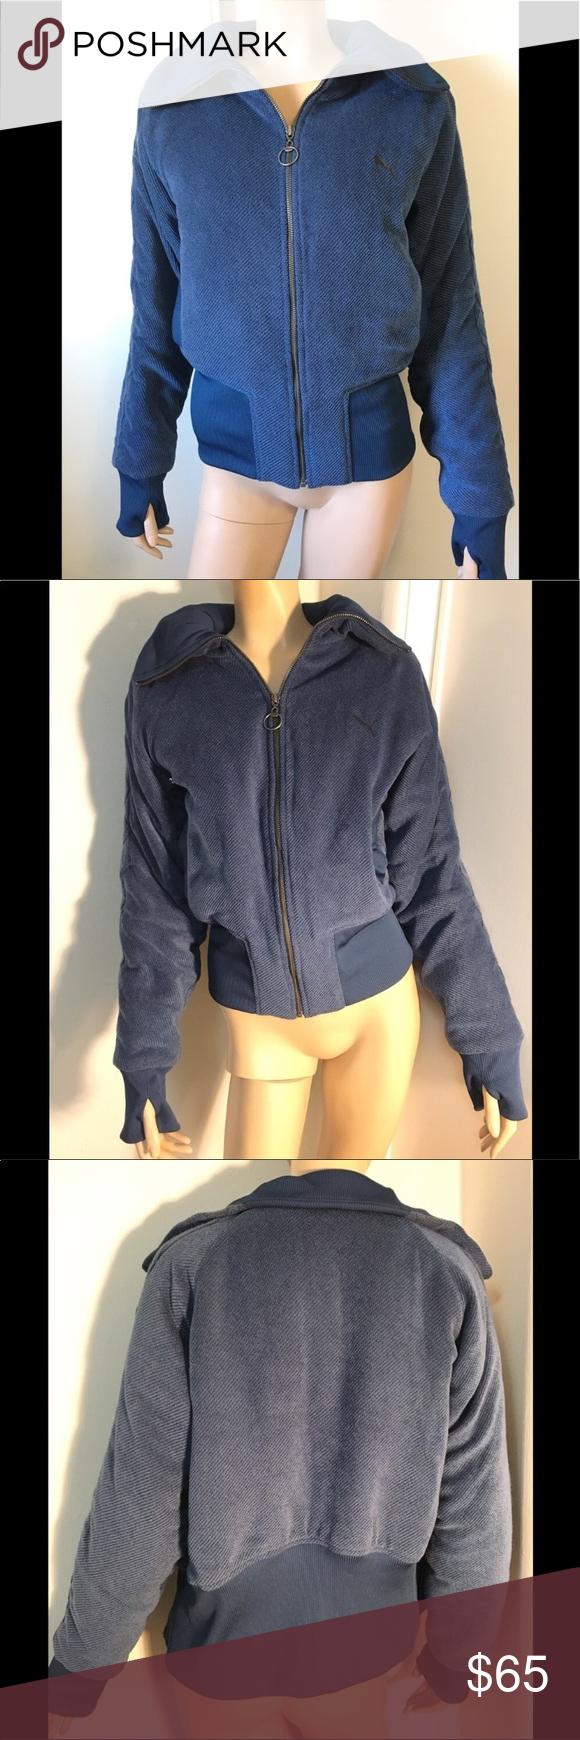 Puma bomber jacket blue Medium Clothes design, Bomber